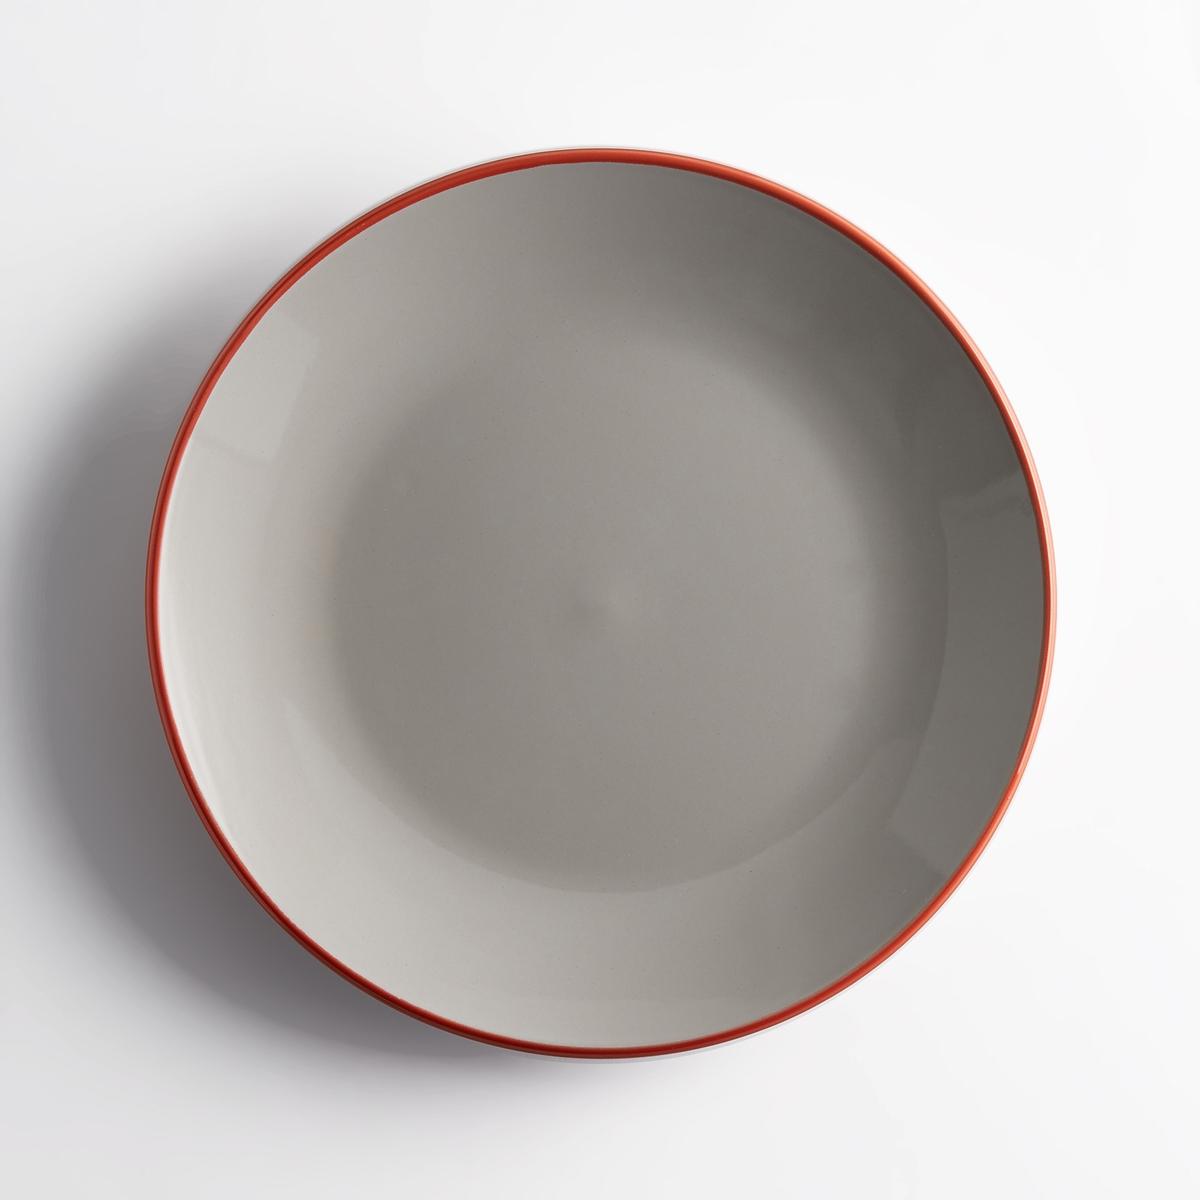 Комплект из 4 мелких тарелок из фаянса Dotka комплект из 4 мелких тарелок из фарфора ø25 см agaxan